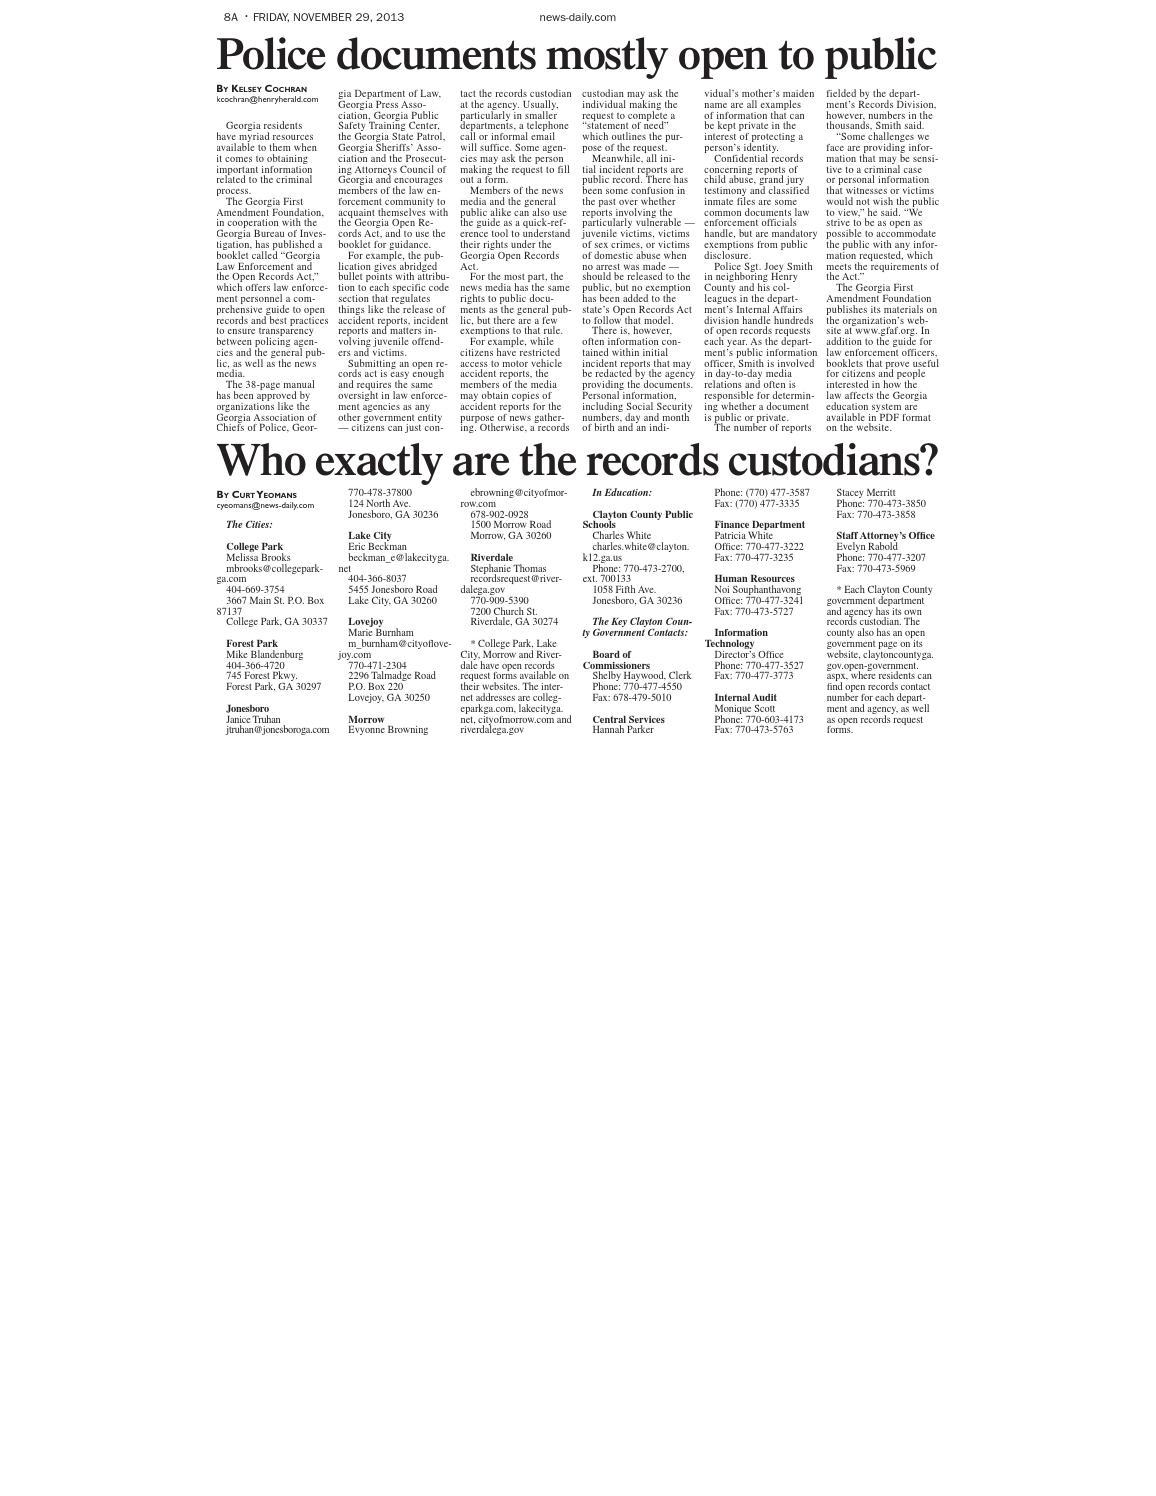 Claytonfreedomofinformation by Gwinnett Daily Post - issuu